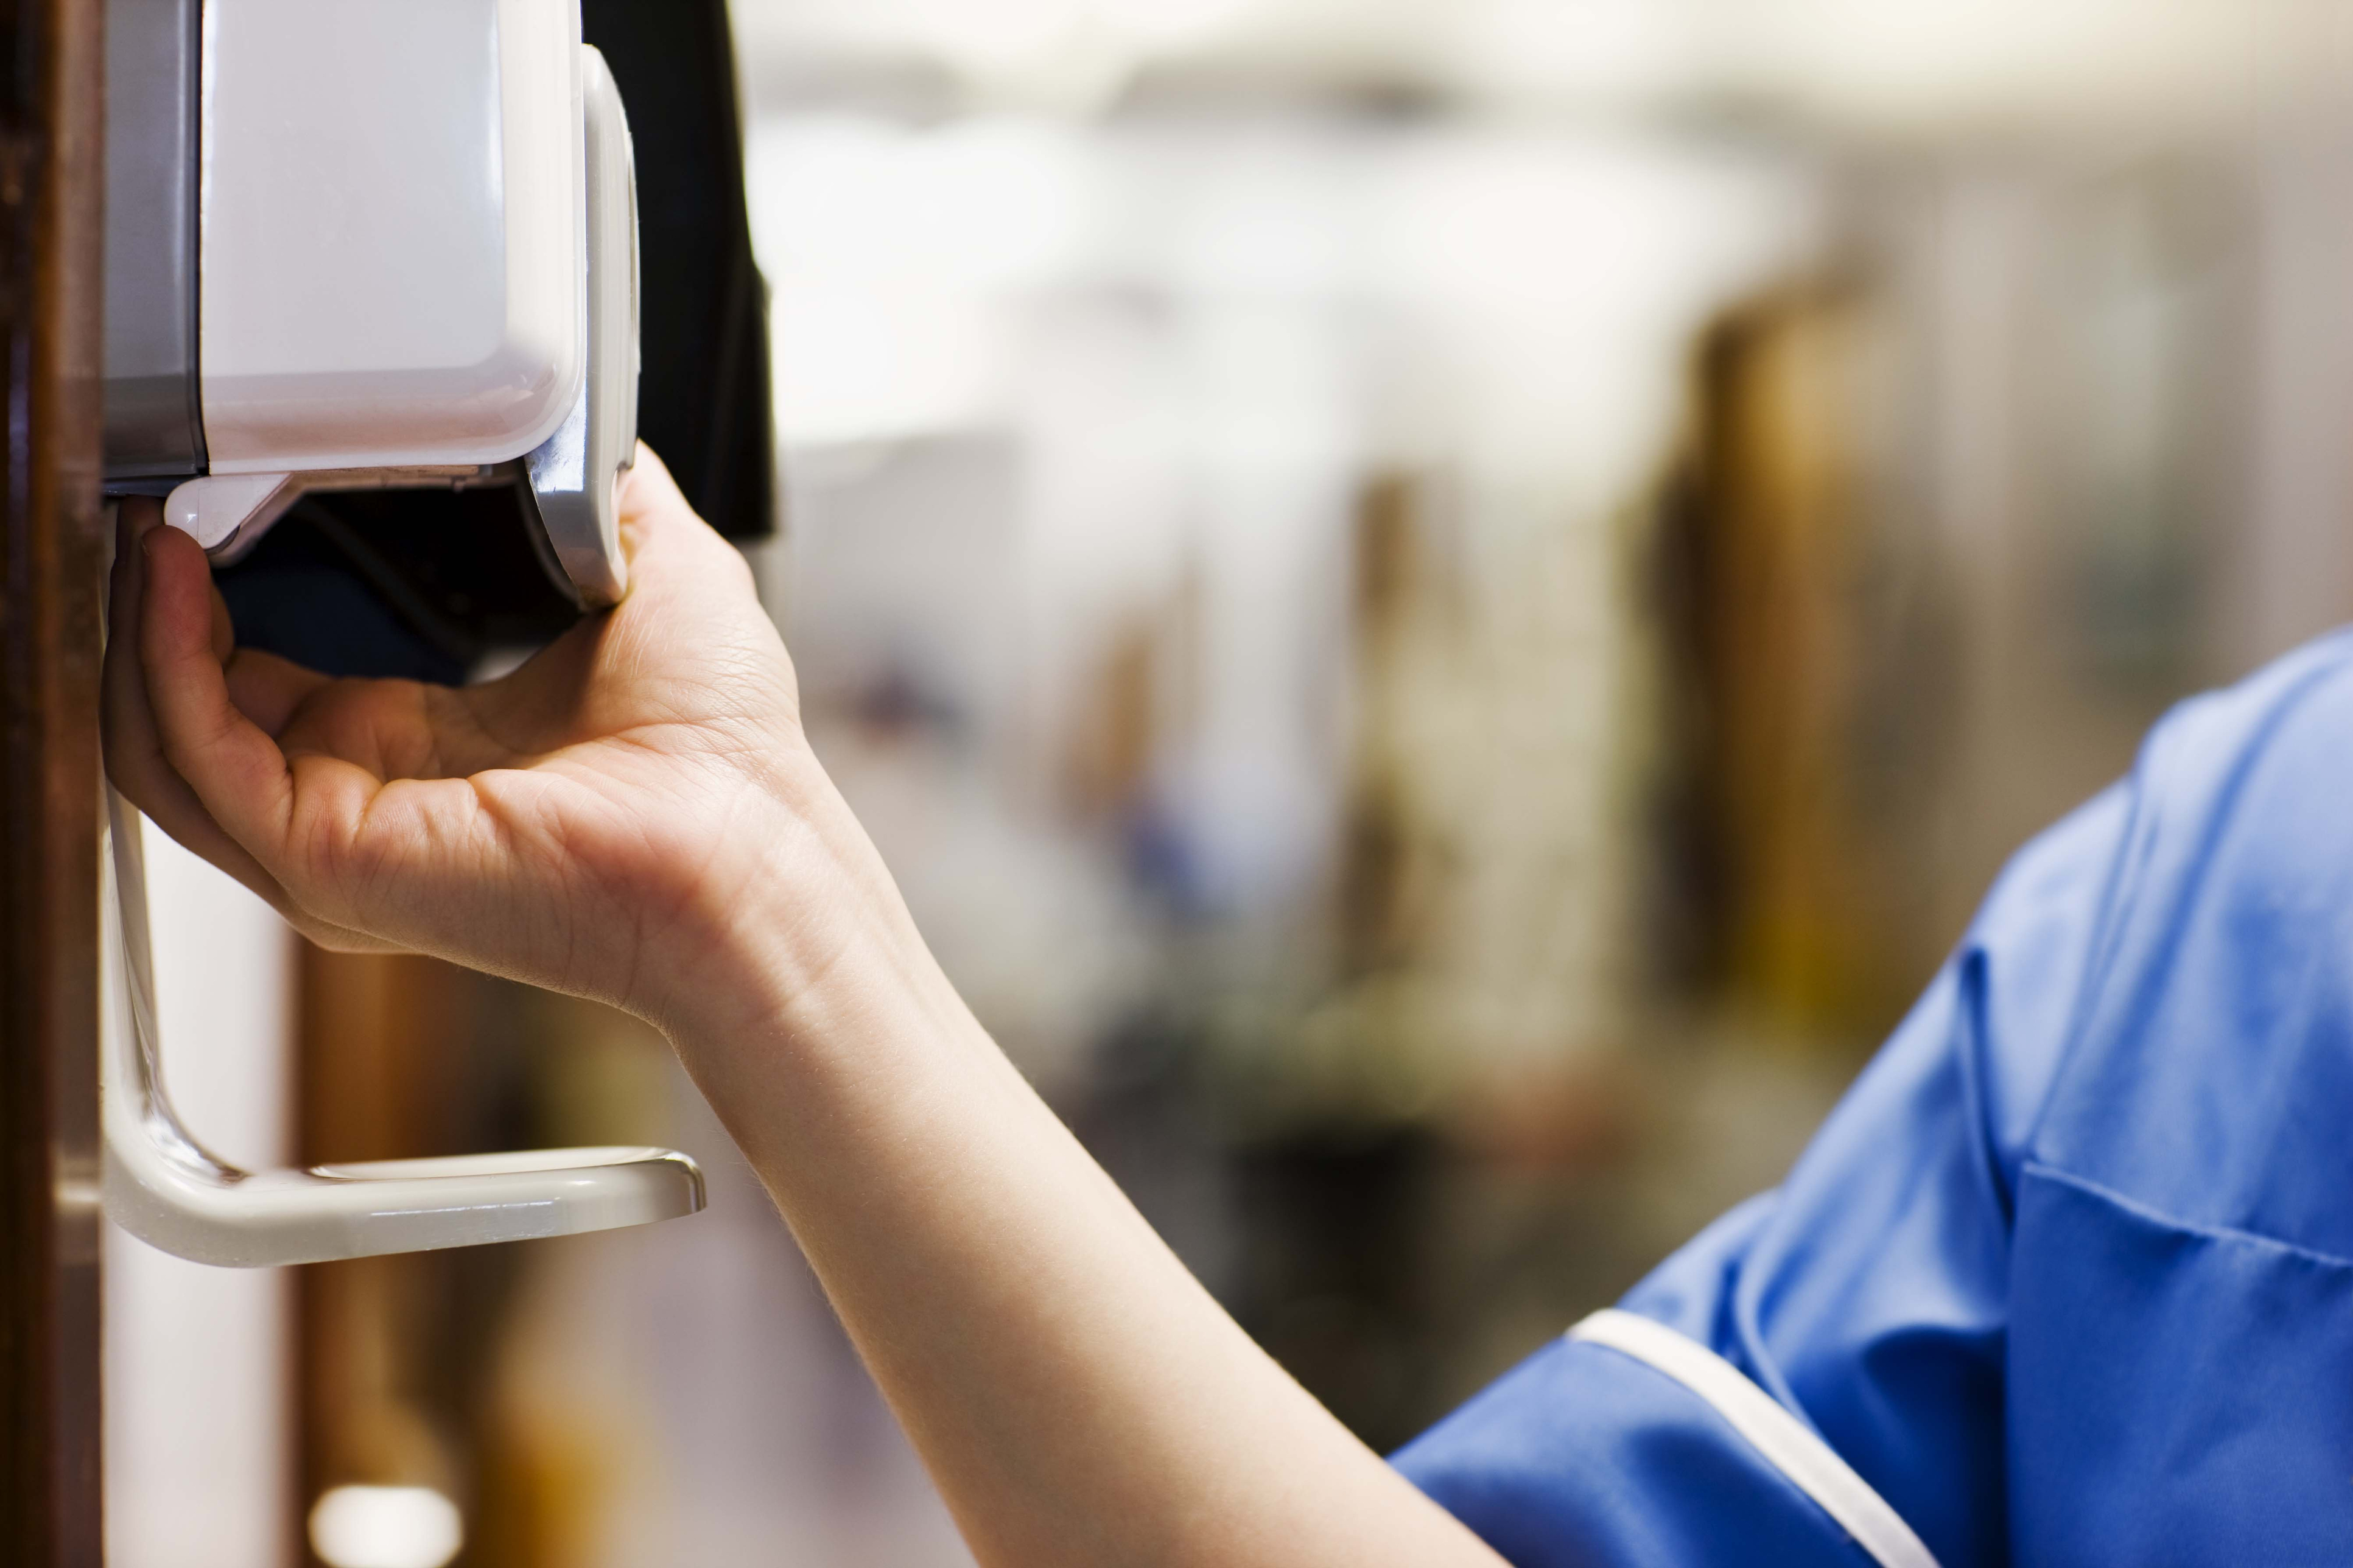 Hand sanitizer bacteria tolerance